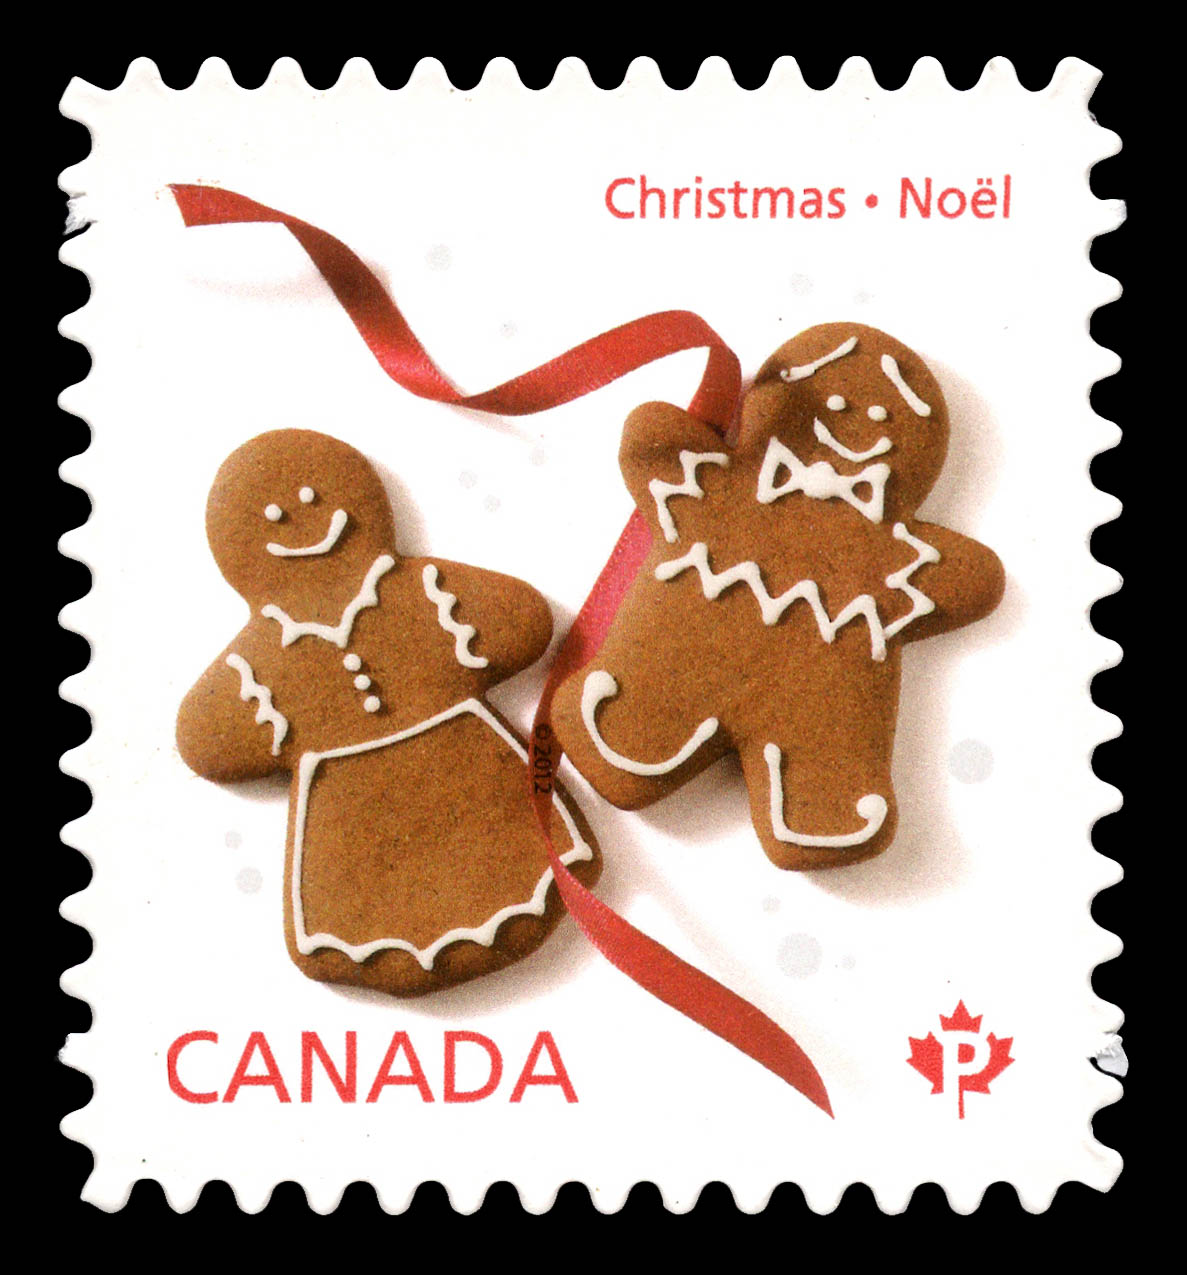 Gingerbread Man Cookies Canada Postage Stamp | Christmas Cookies